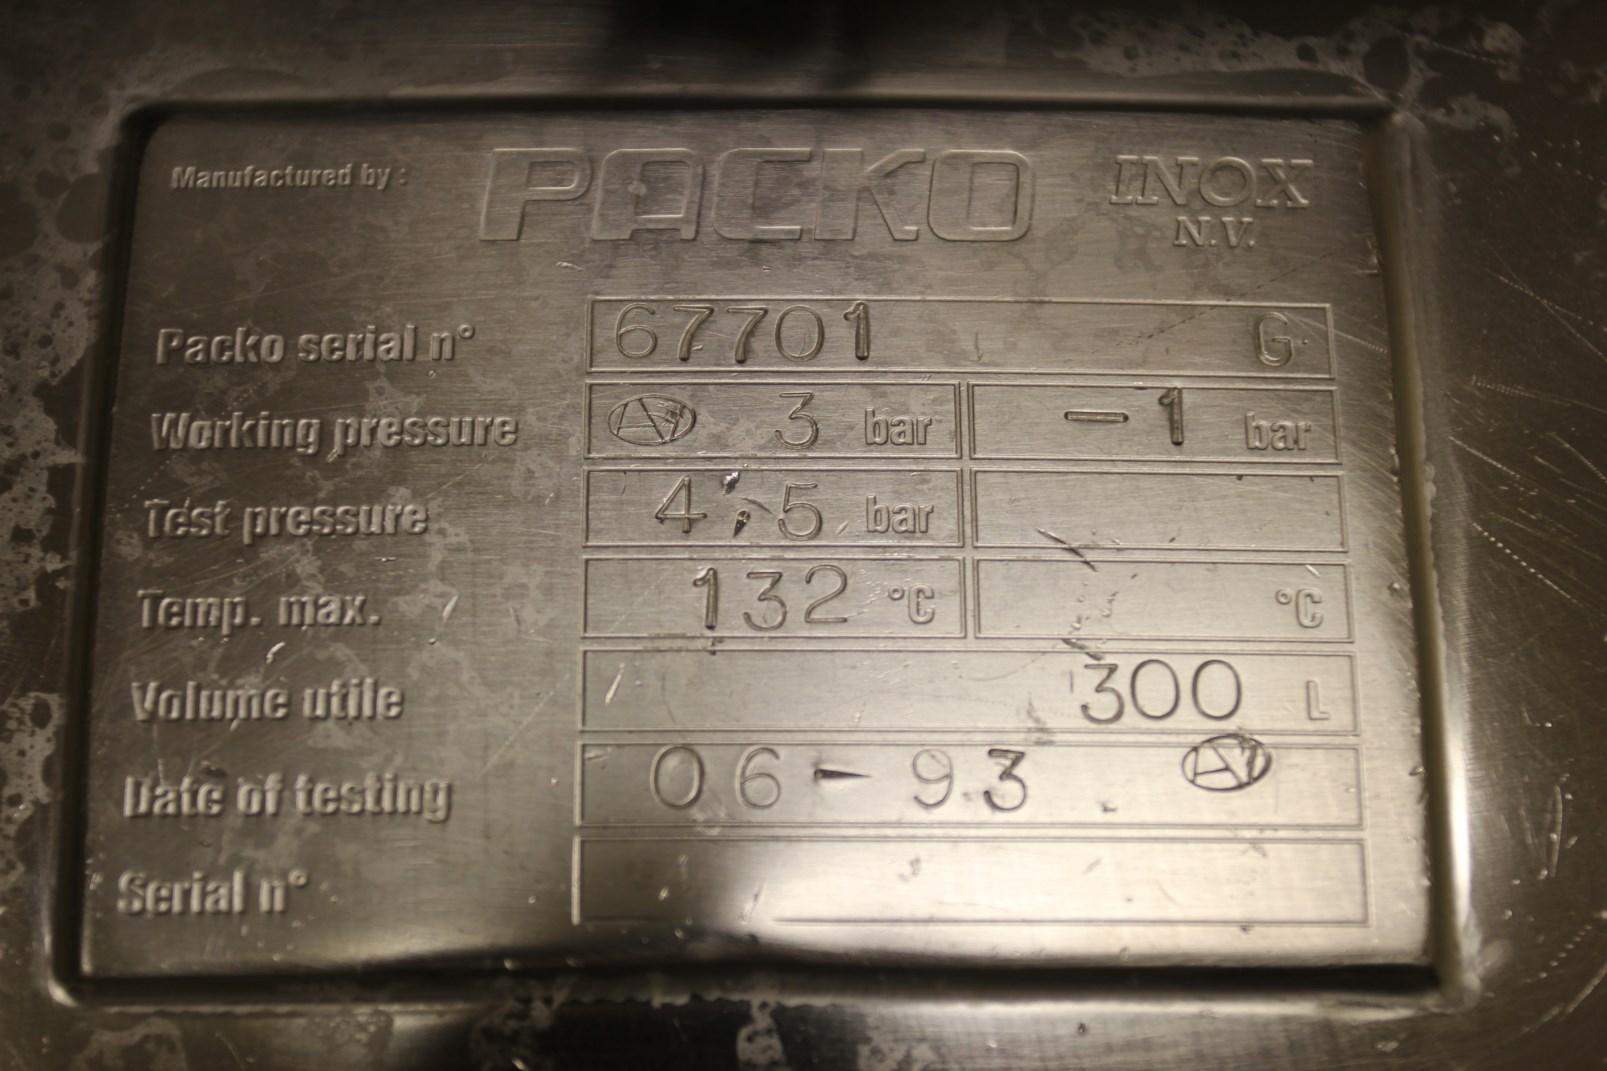 Lot 52 - 1993 Packo Mobile Vessel, s/n 67701G, Stainless Steel Construction, 300 Liter Capacity, 132 Degree